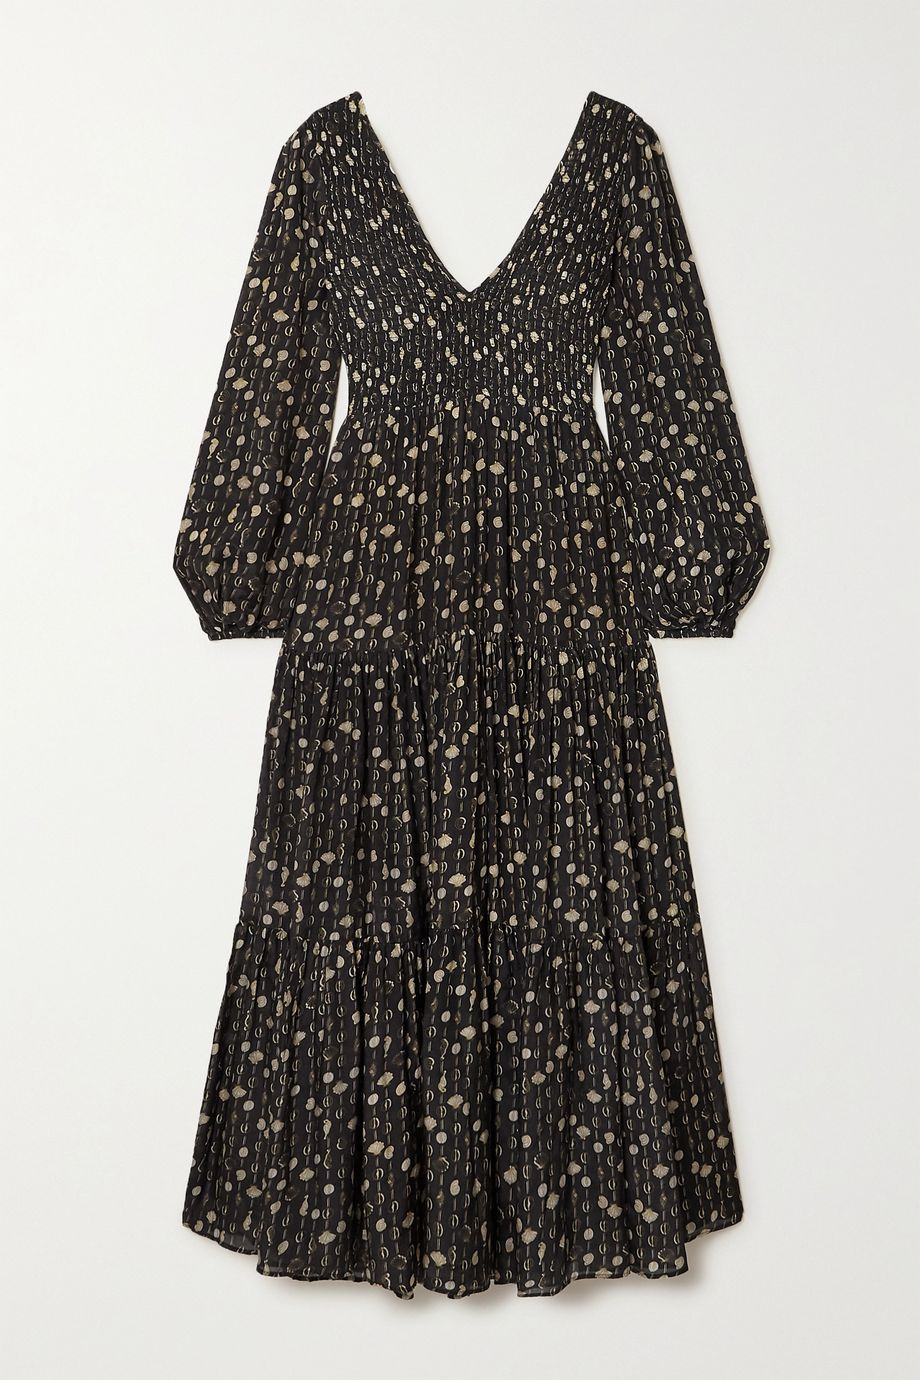 RIXO Brooke shirred tiered printed modal maxi dress